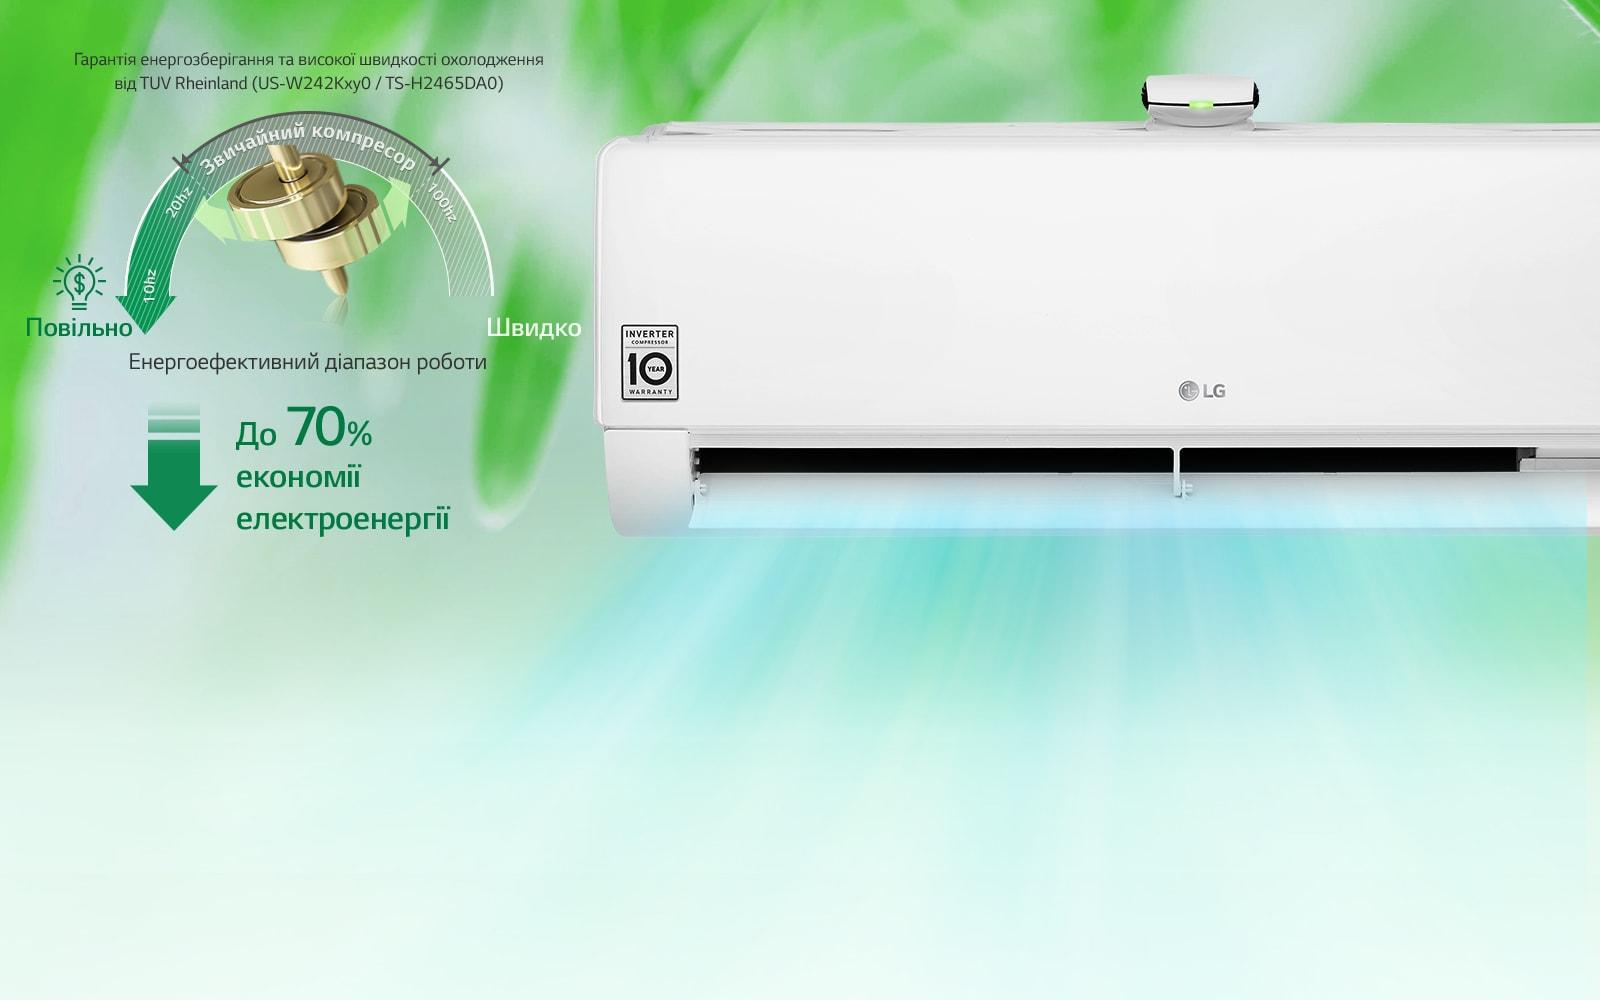 RAC EU DUALCOOL AirPurification 04 1 Energy Saving D - LG  AP12RT